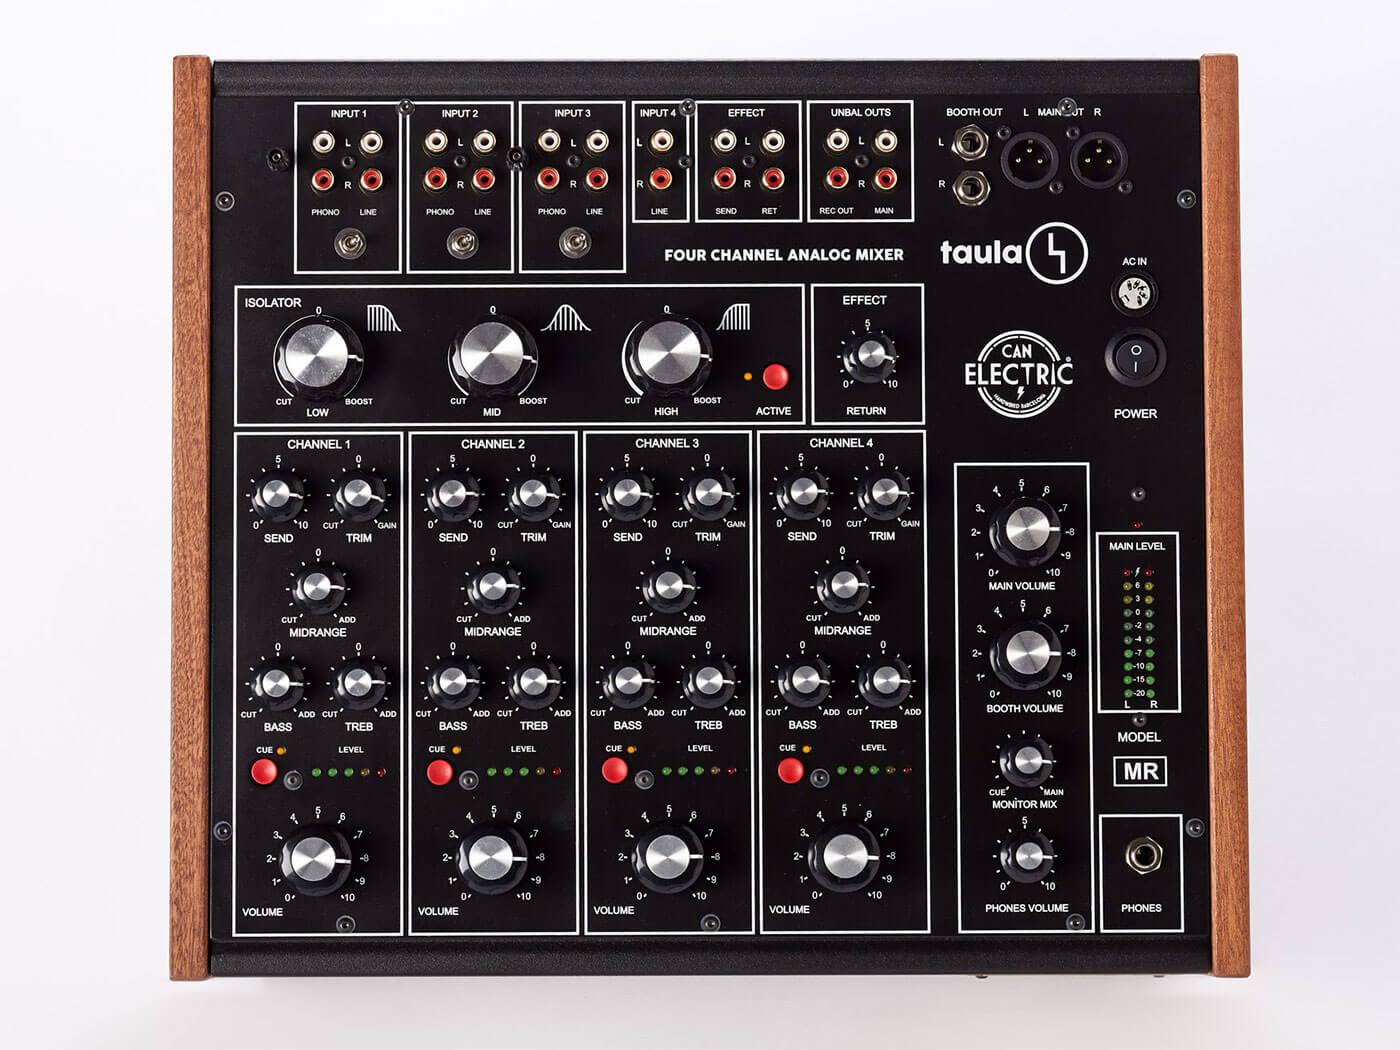 Can Electric Taula 4 MV